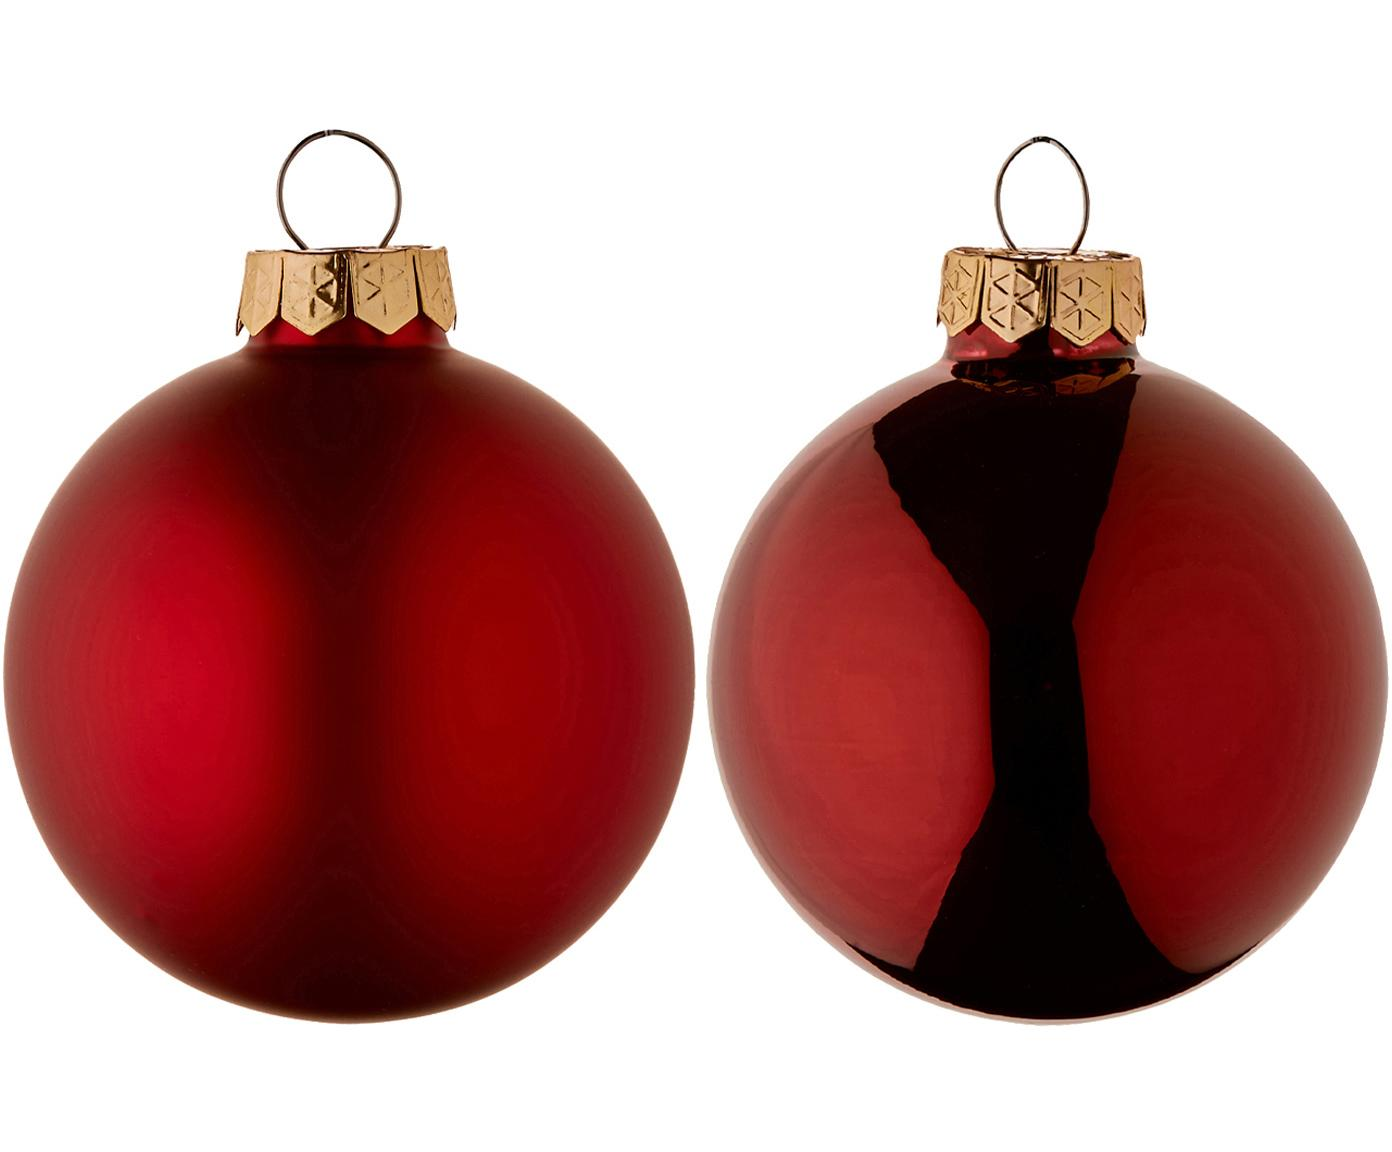 Weihnachtskugel-Set Evergreen Ø 6 cm, 10-tlg., Rot, Ø 6 cm